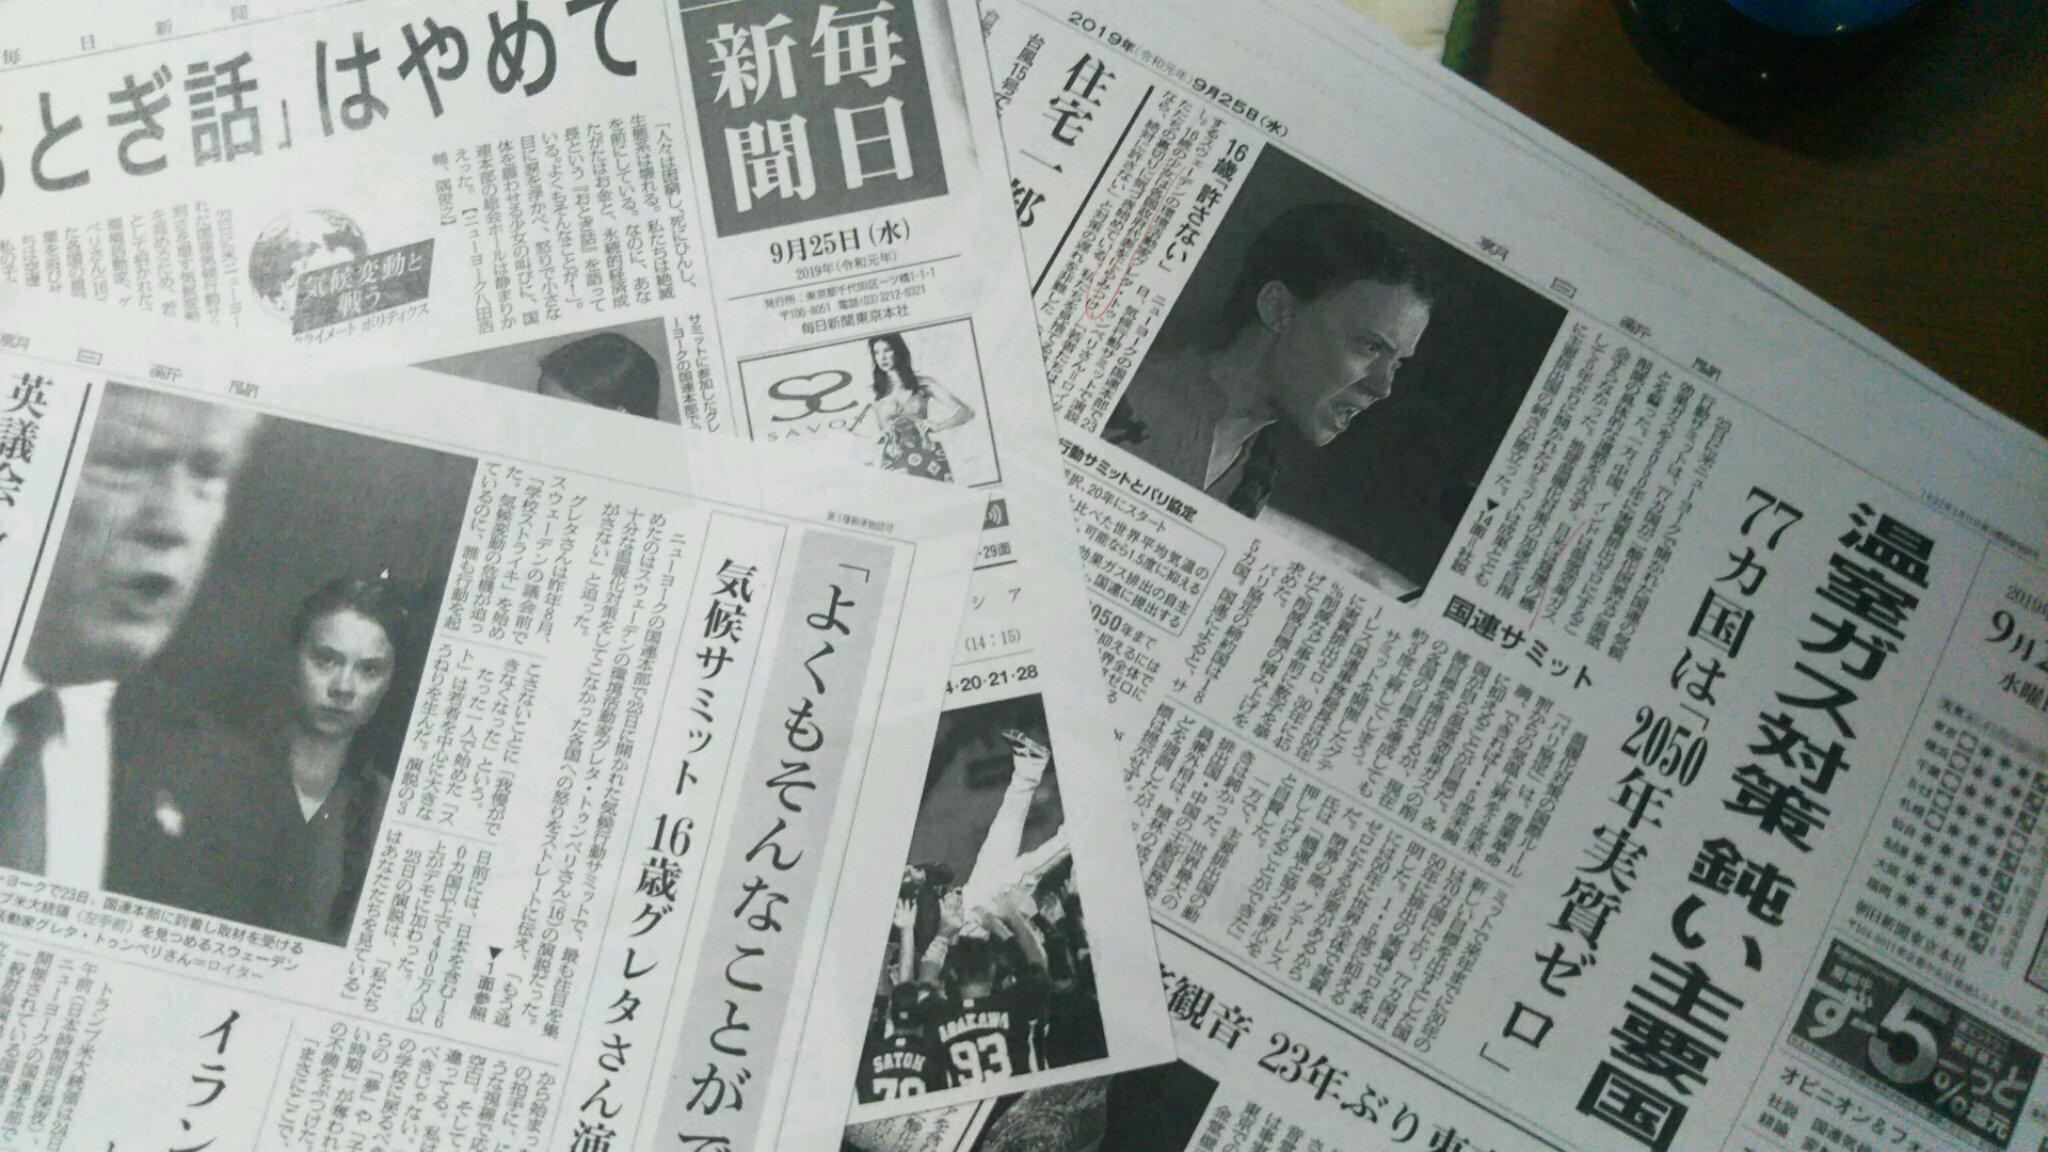 DSC_0129 グレタ報道の朝日毎日新聞。